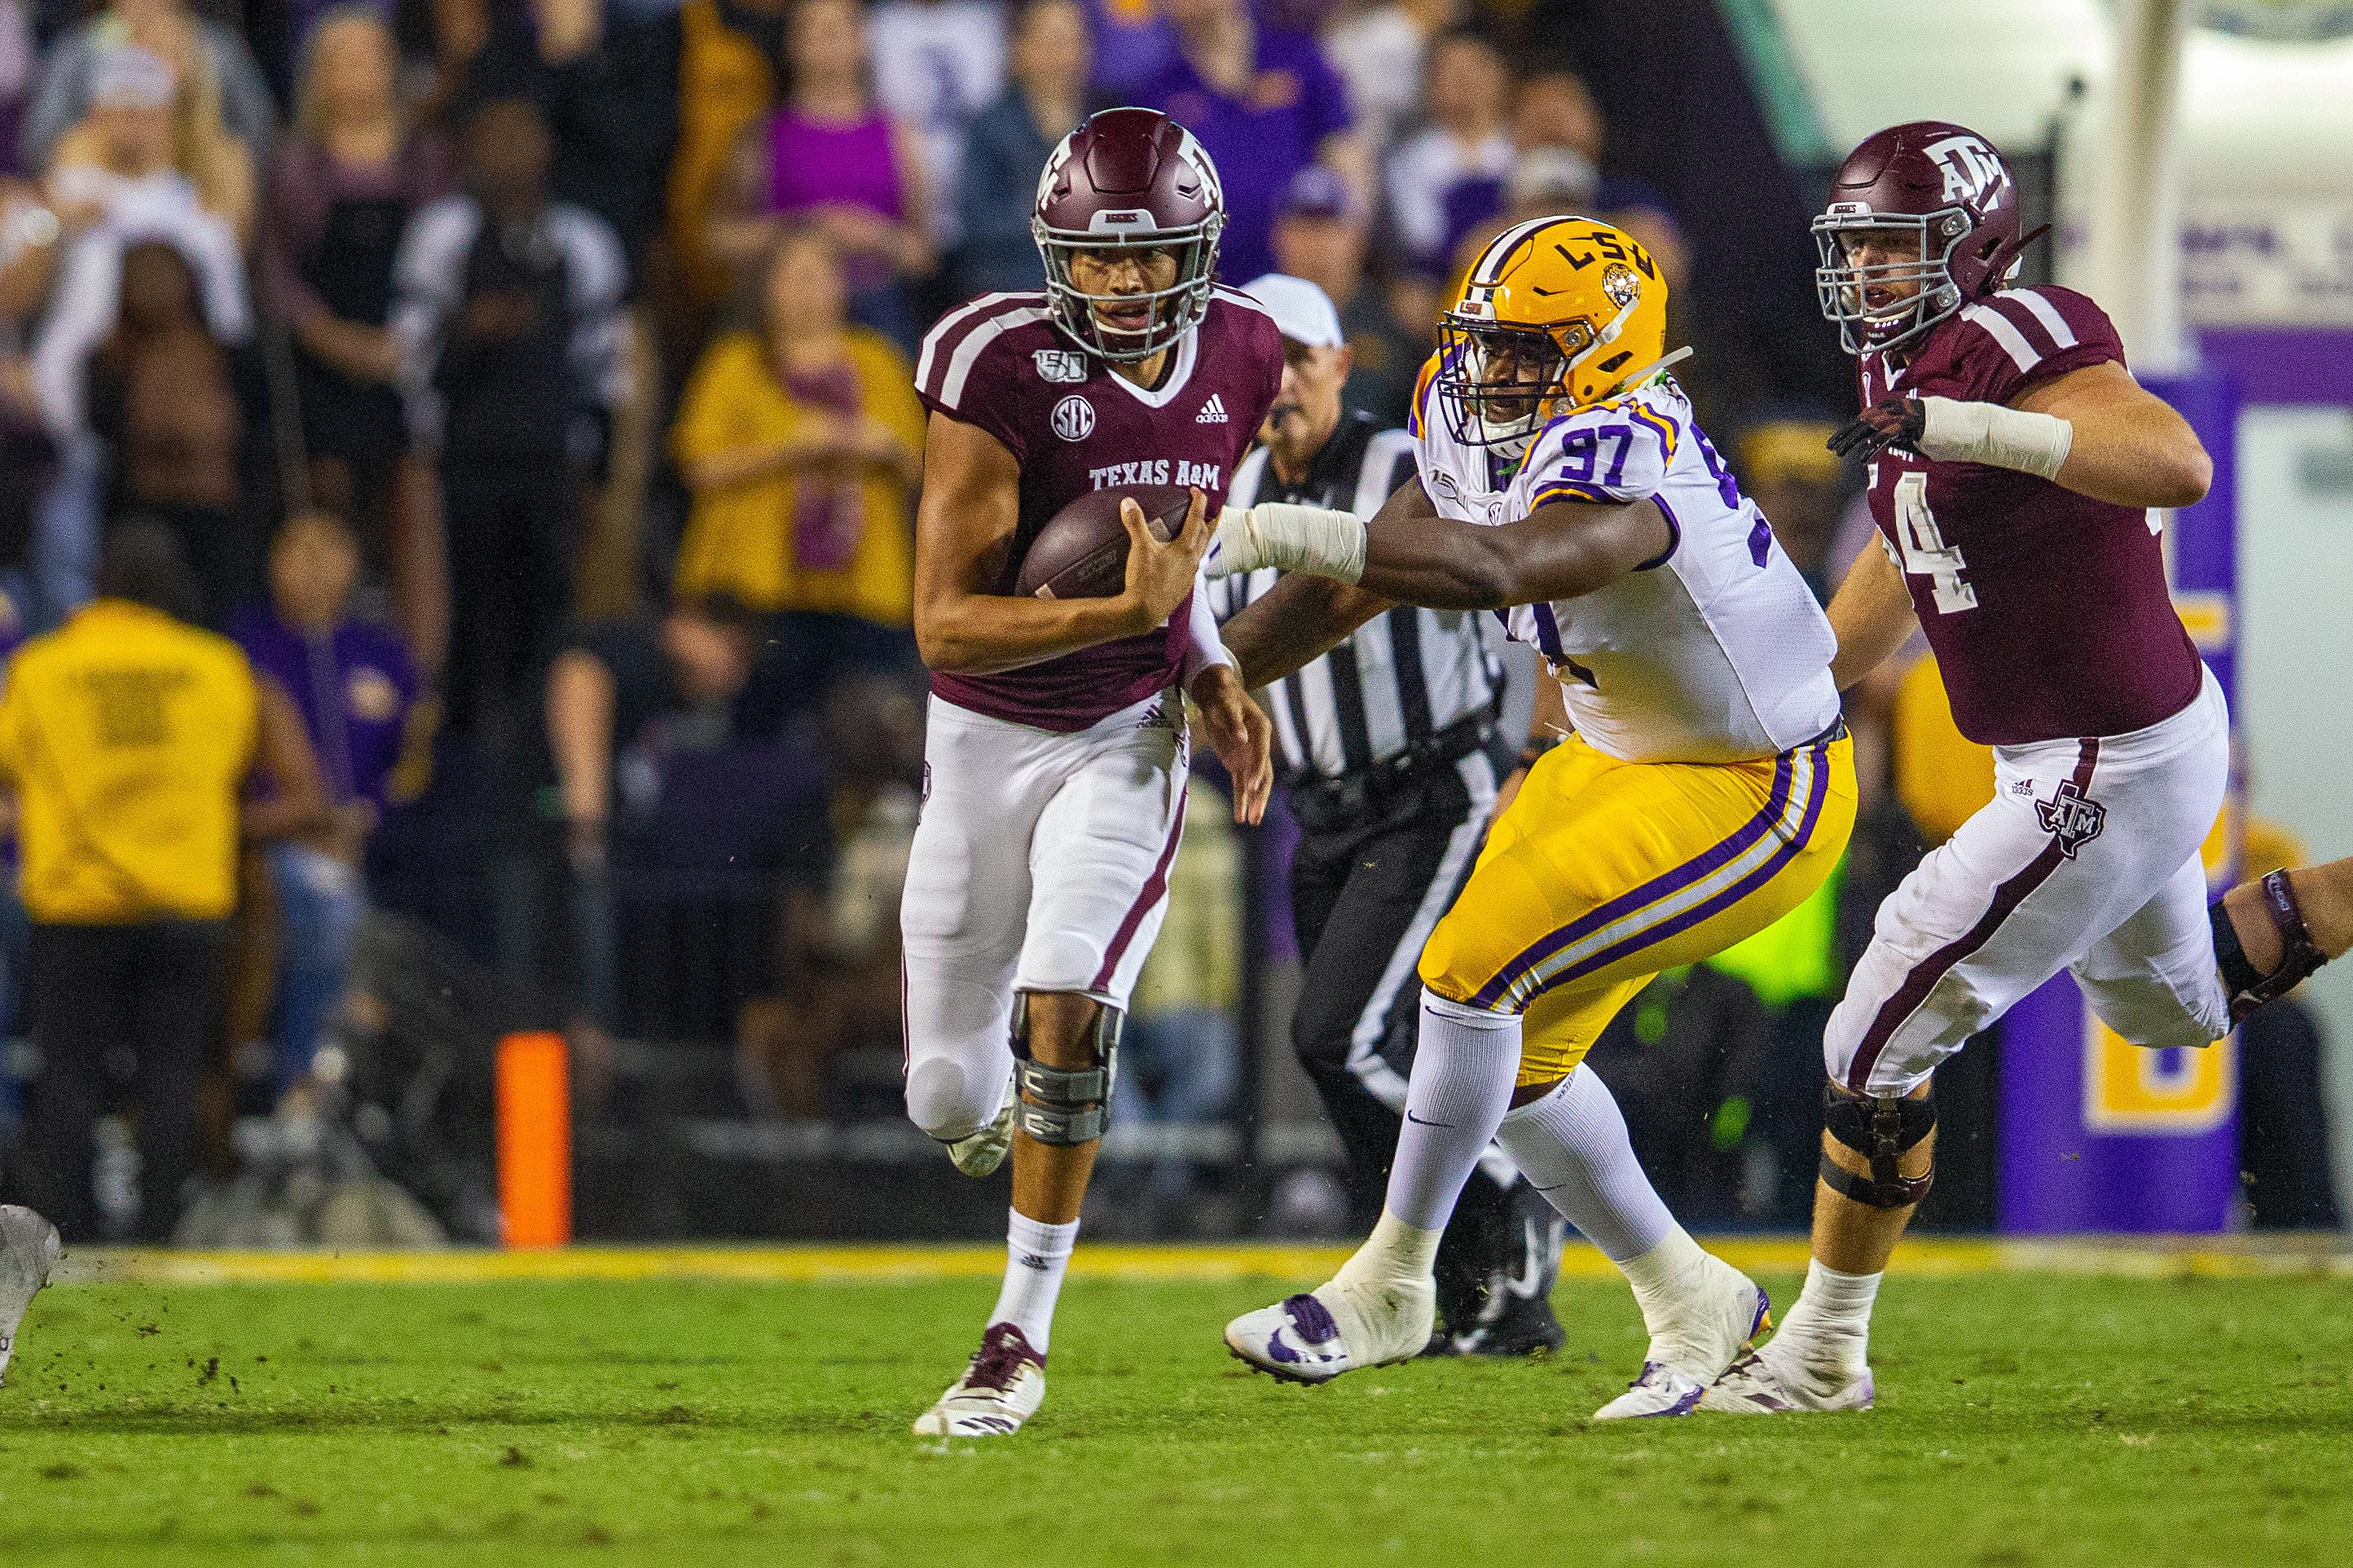 COLLEGE FOOTBALL: NOV 30 Texas A&M at LSU